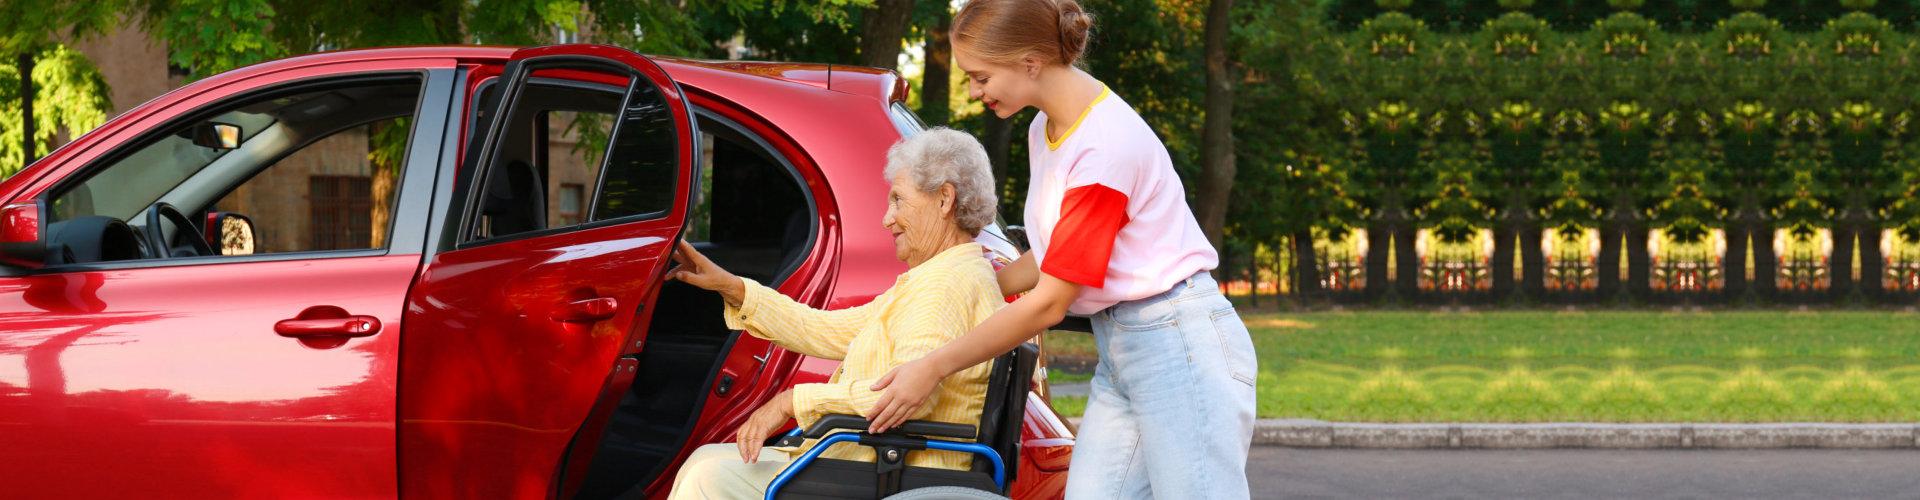 woman helping a senior woman get inside the car